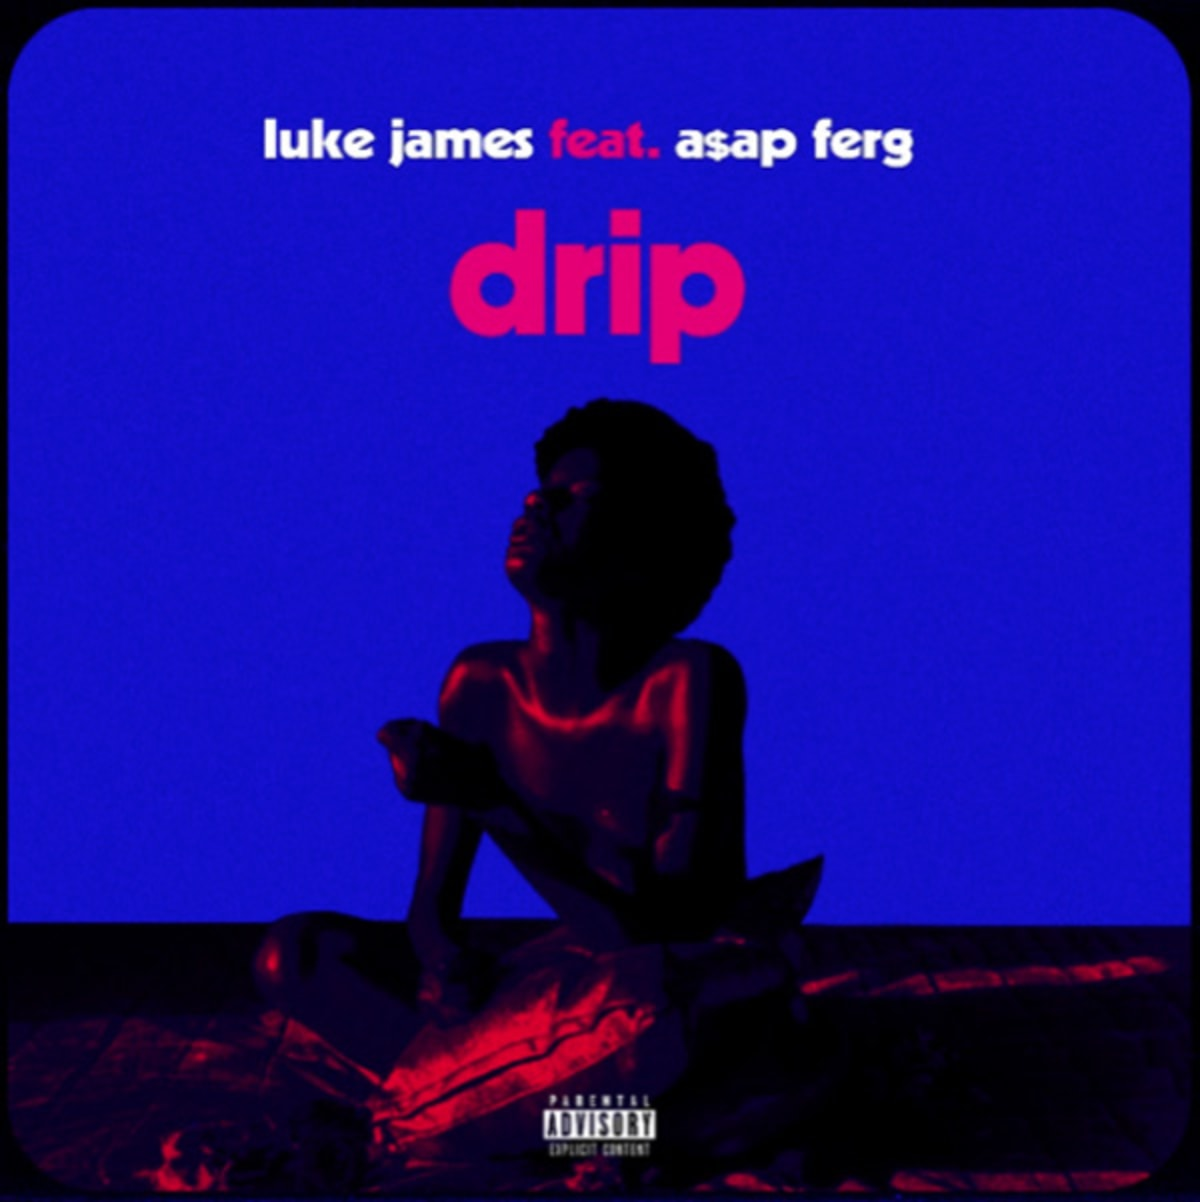 Luke James Drip Remix